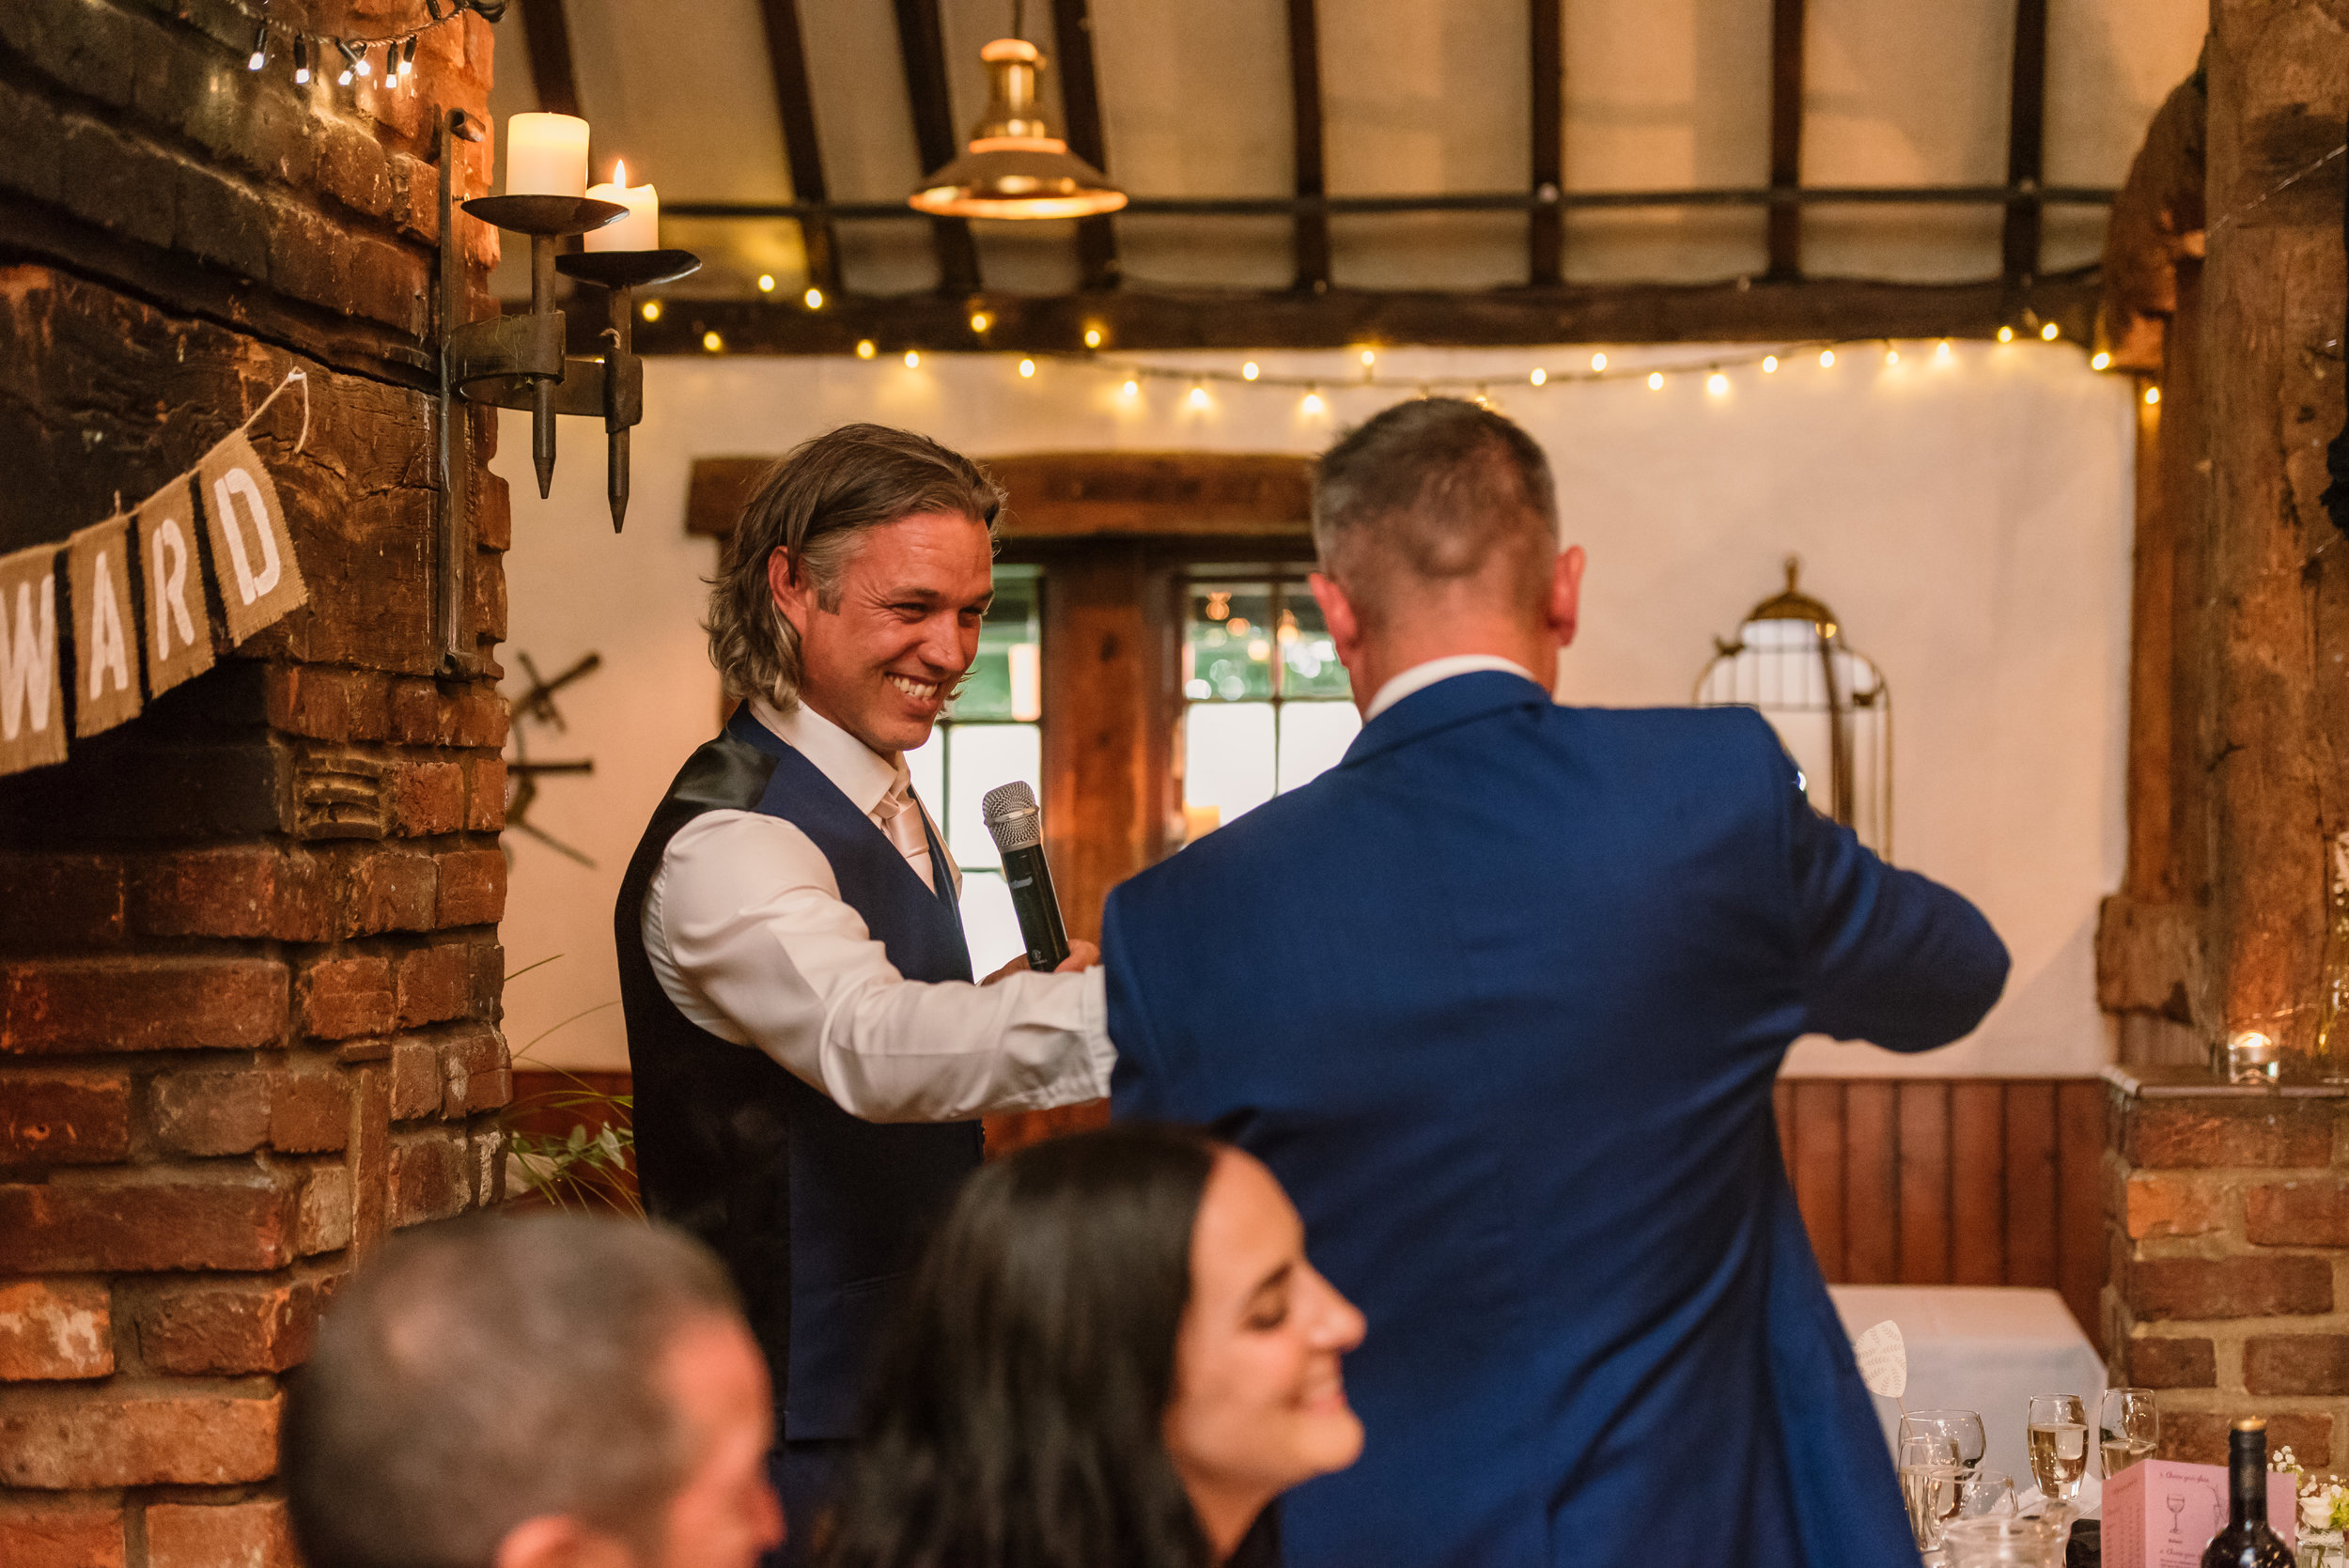 Sarah-Fishlock-Photography : Hampshire-wedding-photographer-hampshire : fleet-wedding-photographer-fleet : Meade-Hall-Wedding-Photographer : Meade-Hall-Wedding-Photos-907.jpg